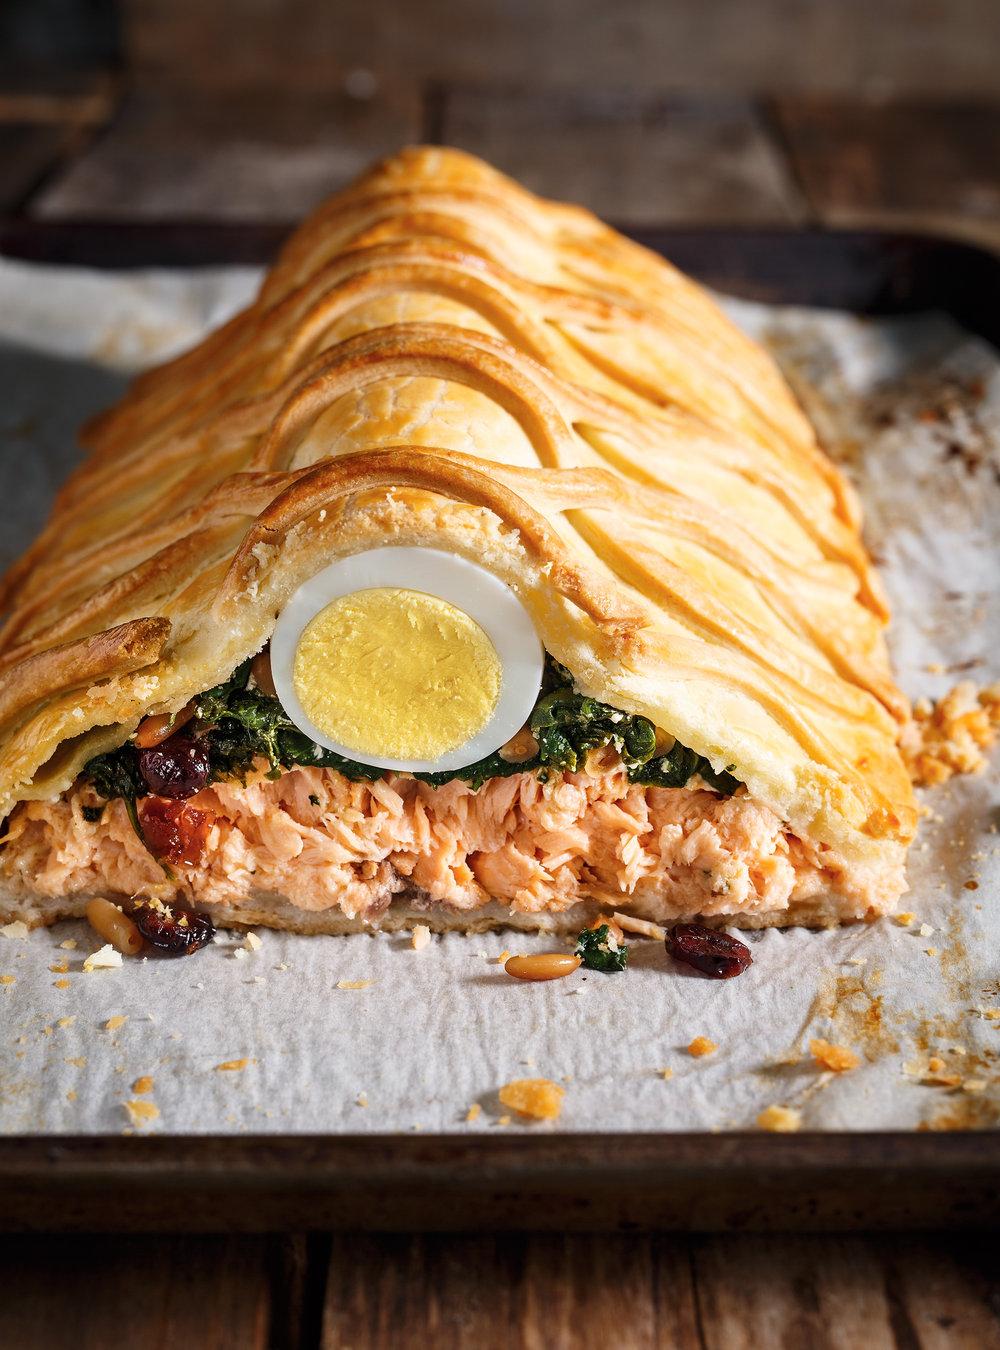 Saumon en cro te koulibiac ricardo for Article de cuisine ricardo